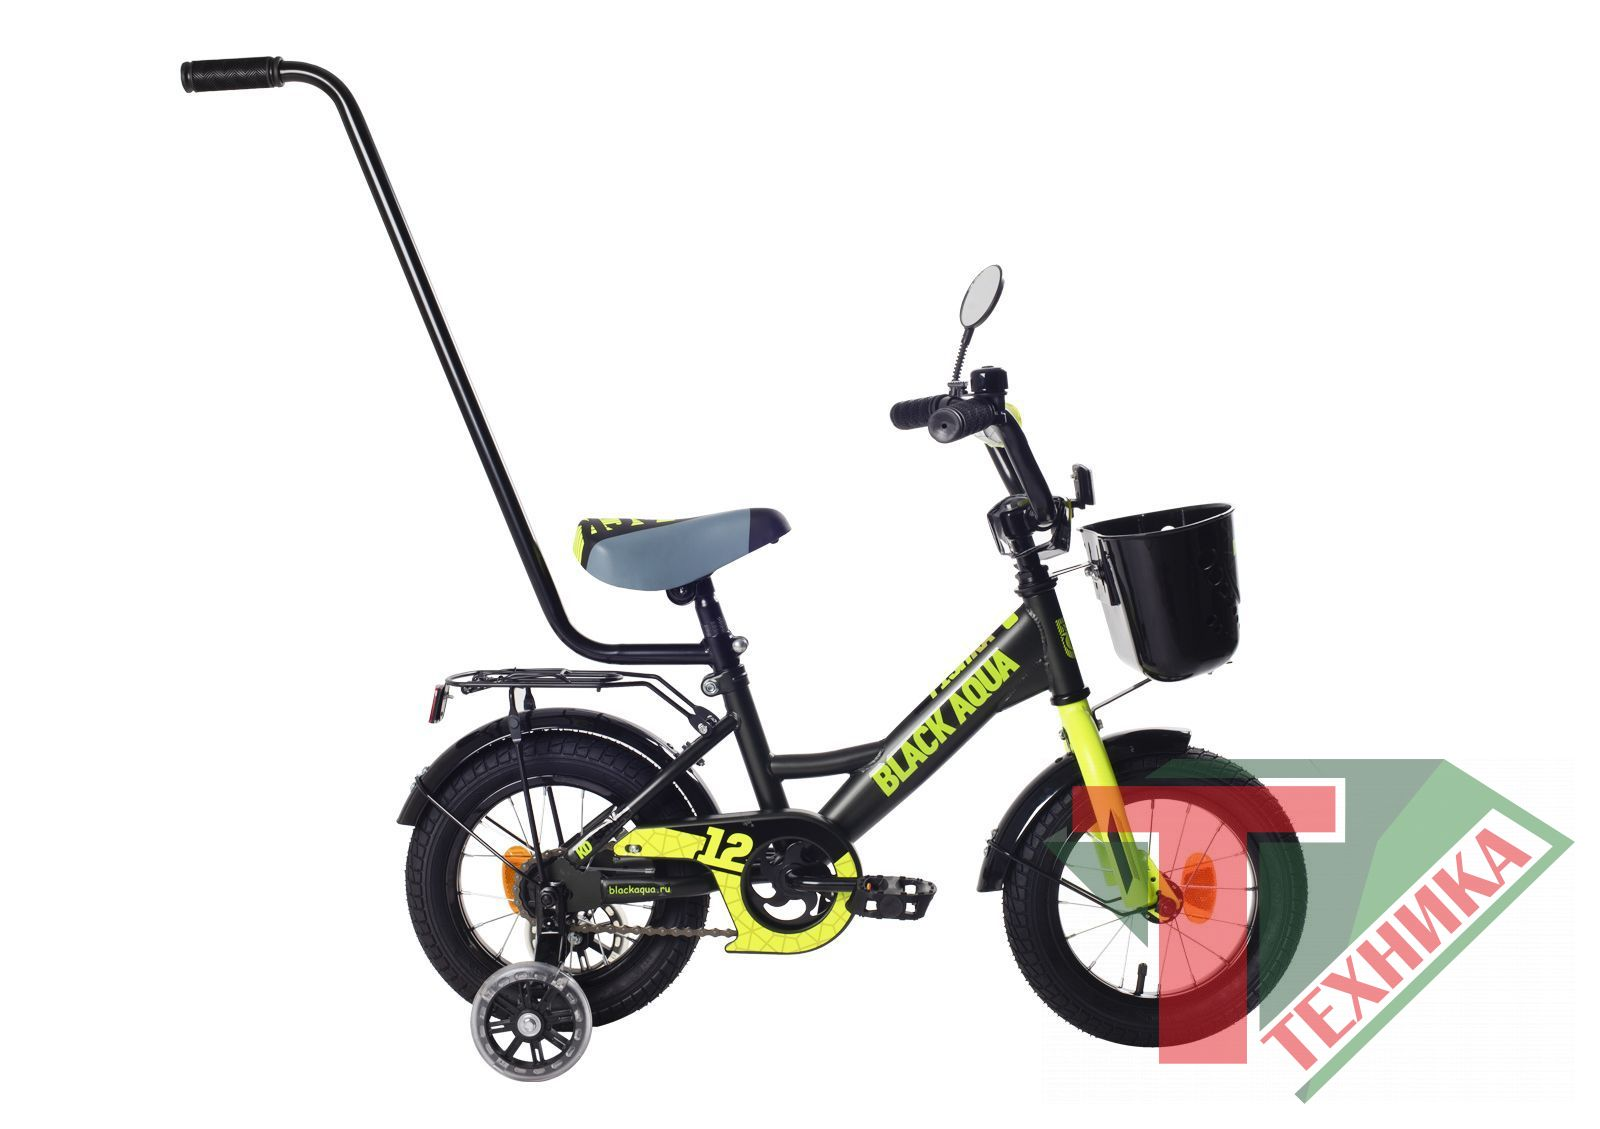 Велосипед KG1427 Black aqua Fishka 14 с ручкой matt, со светящимися колесами